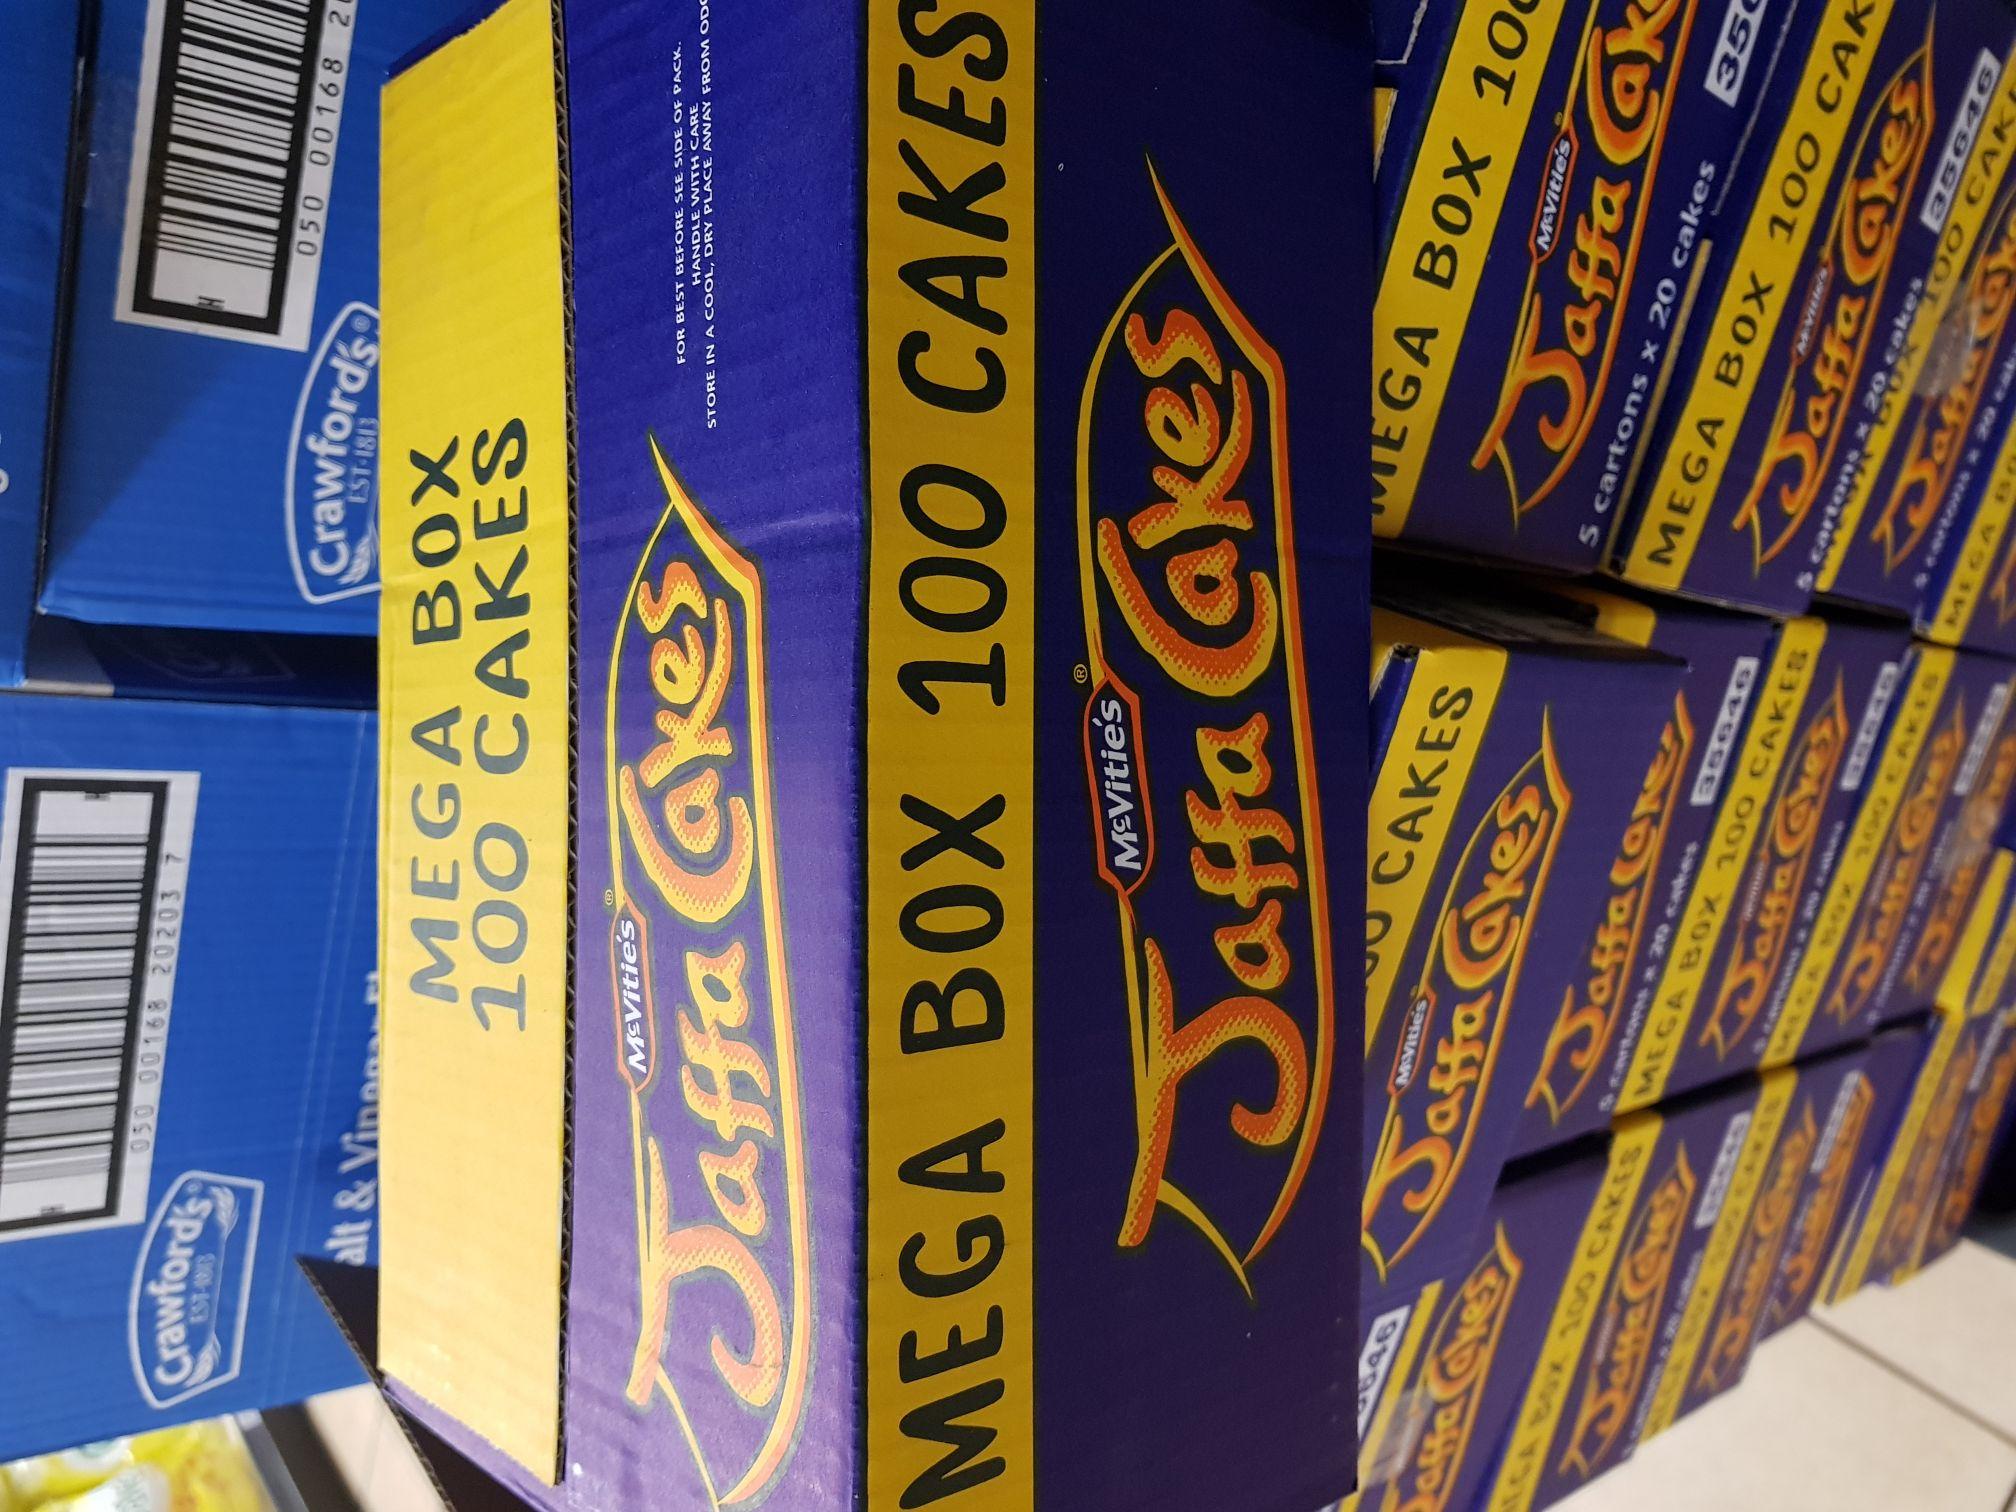 Jaffa cake megabox (5 cartons X 20 cakes) £3.99 @ farmfoods